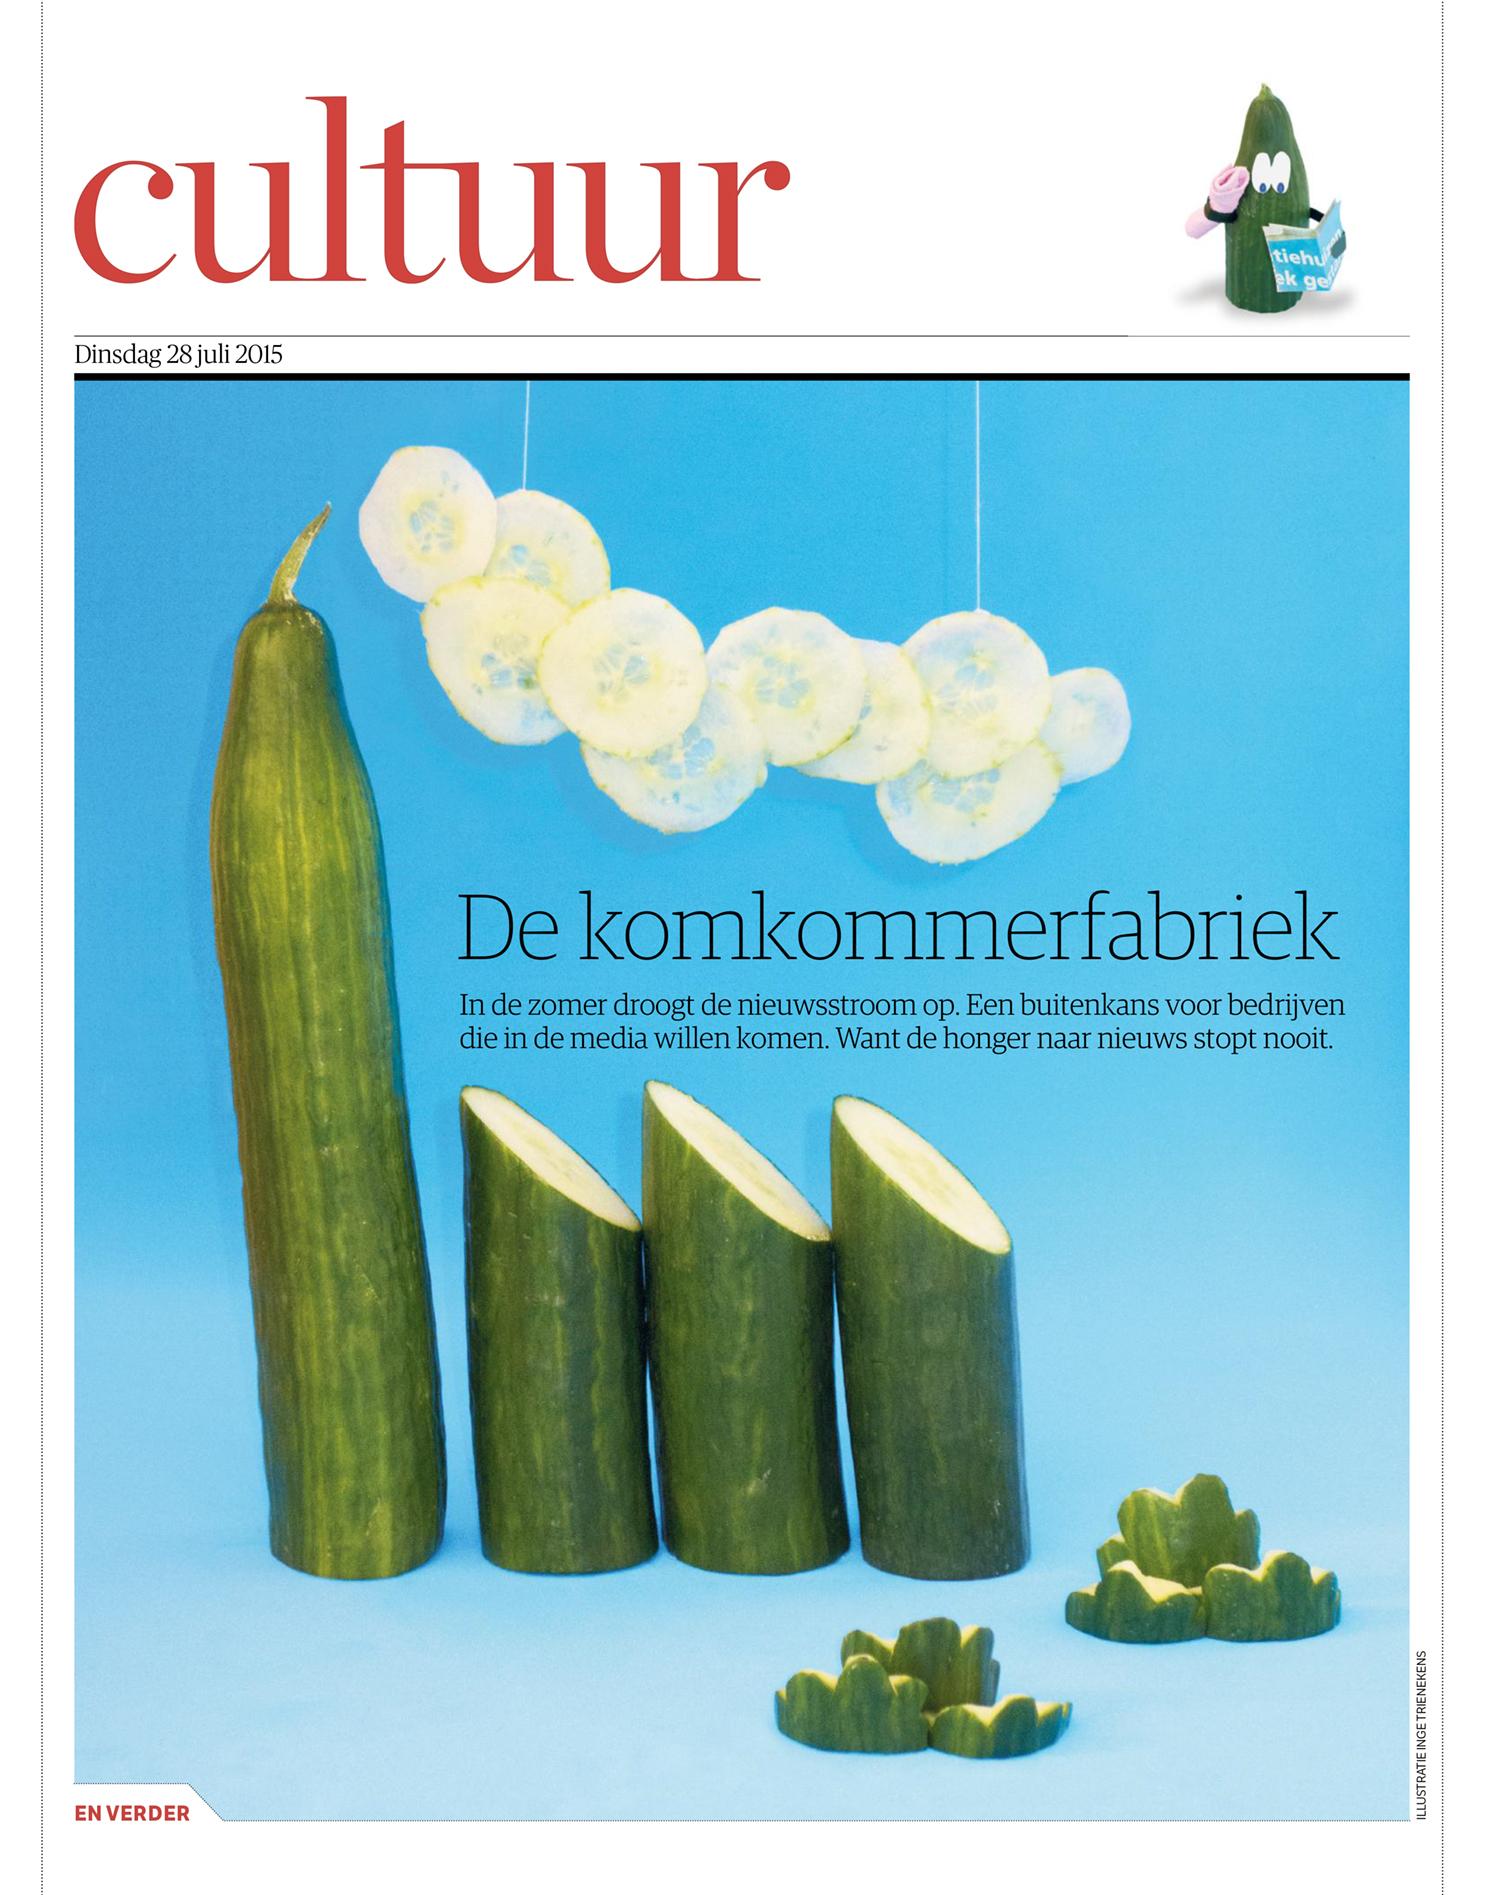 NRC_Handelsblad_20150728_3_02_2-1.jpg